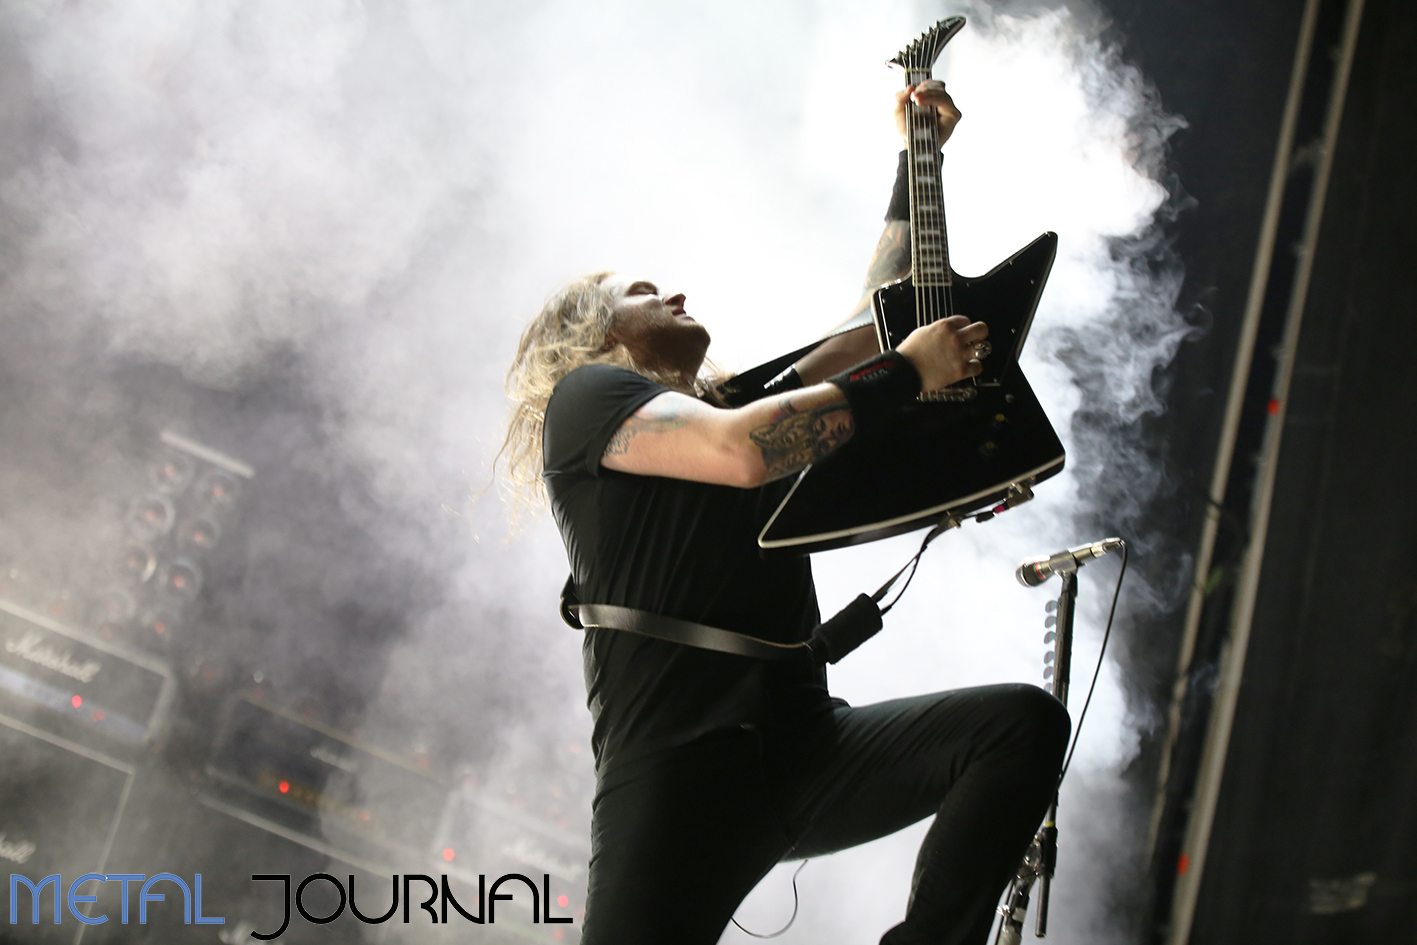 airbourne - leyendas del rock 2019 metal journal pic 12